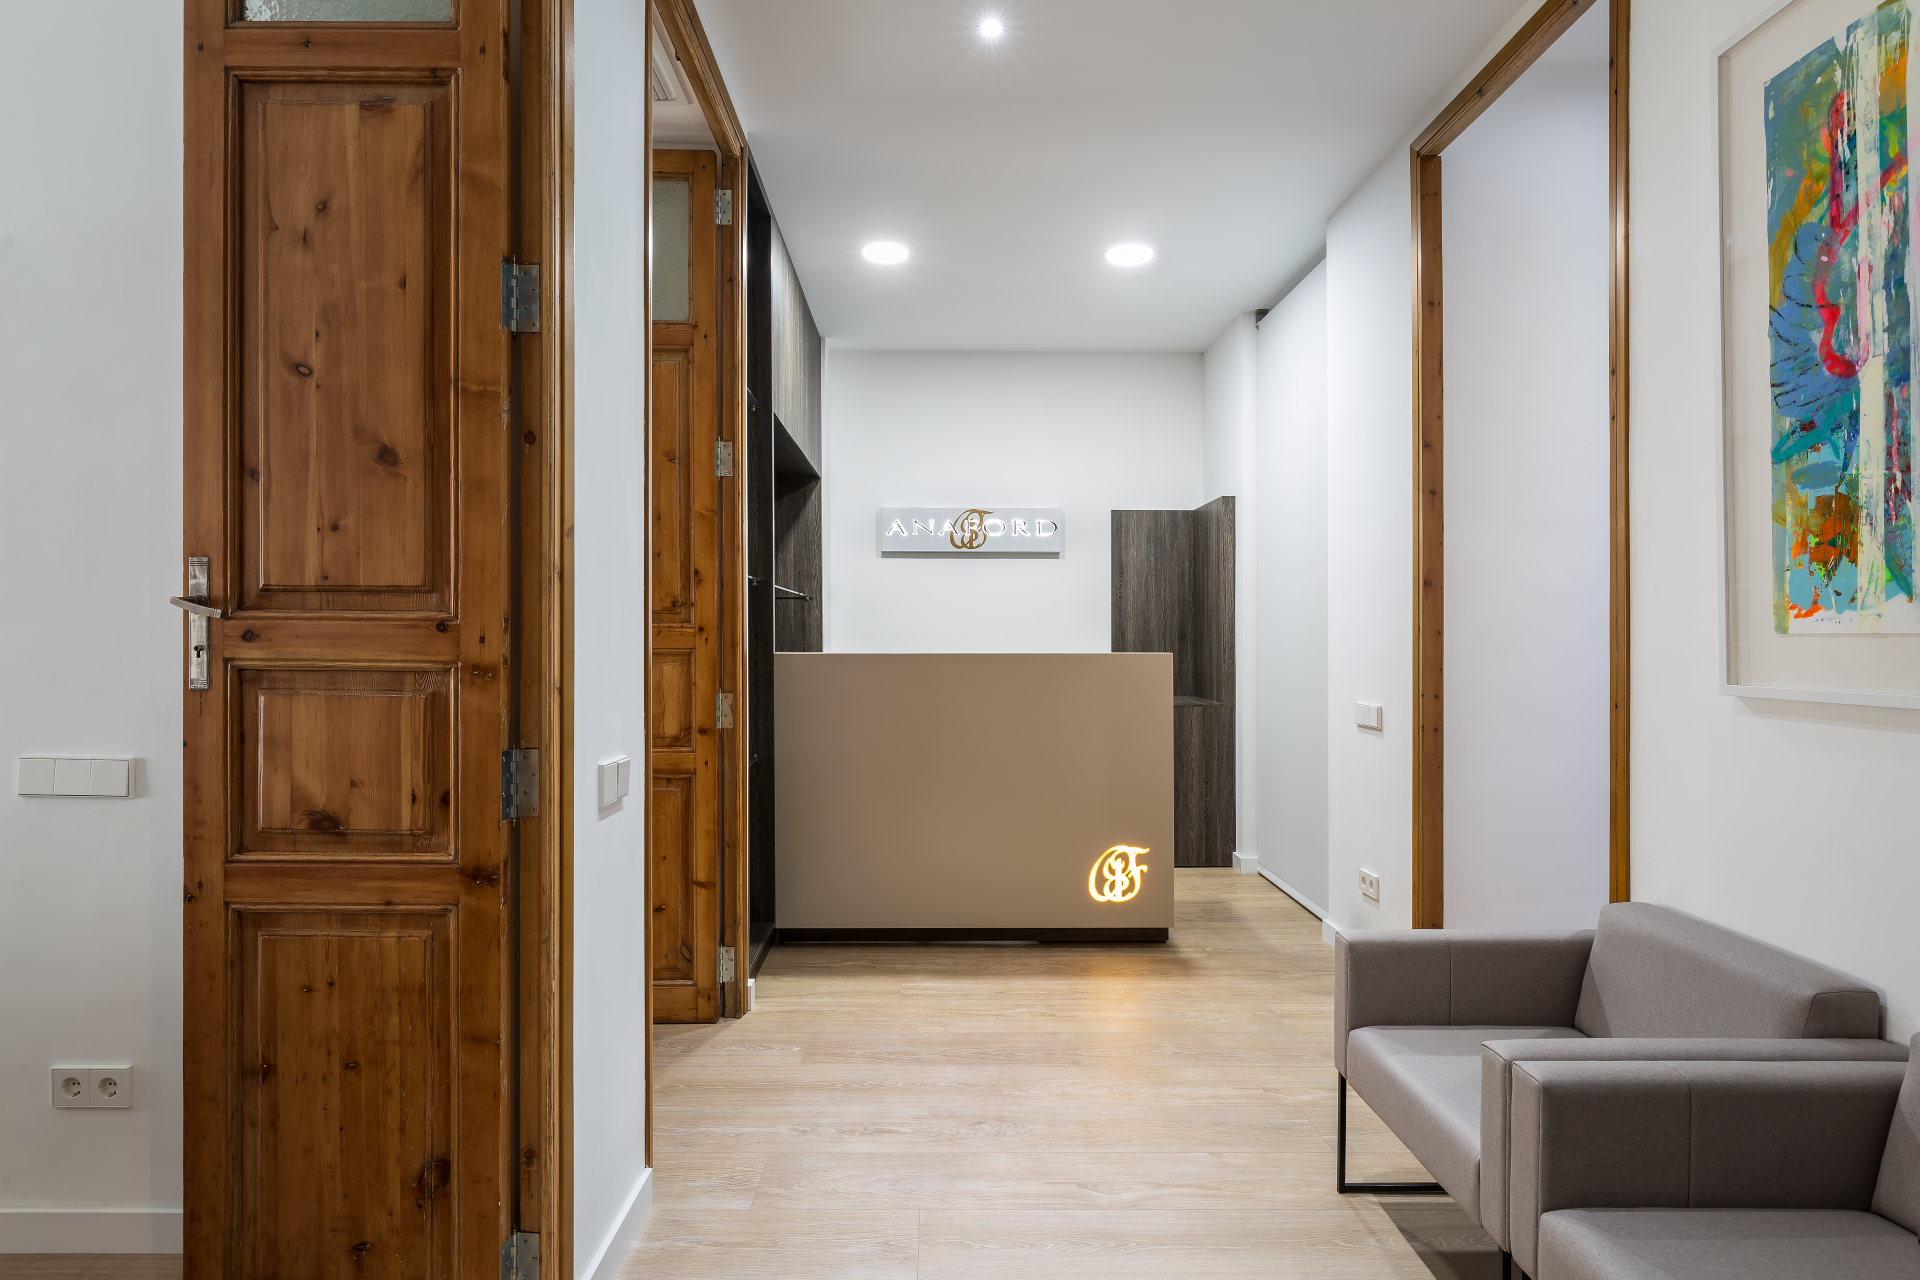 fotografia-arquitectura-valencia-german-cabo-d'estudio-despacho-oficinas-anaford-abogados (2)